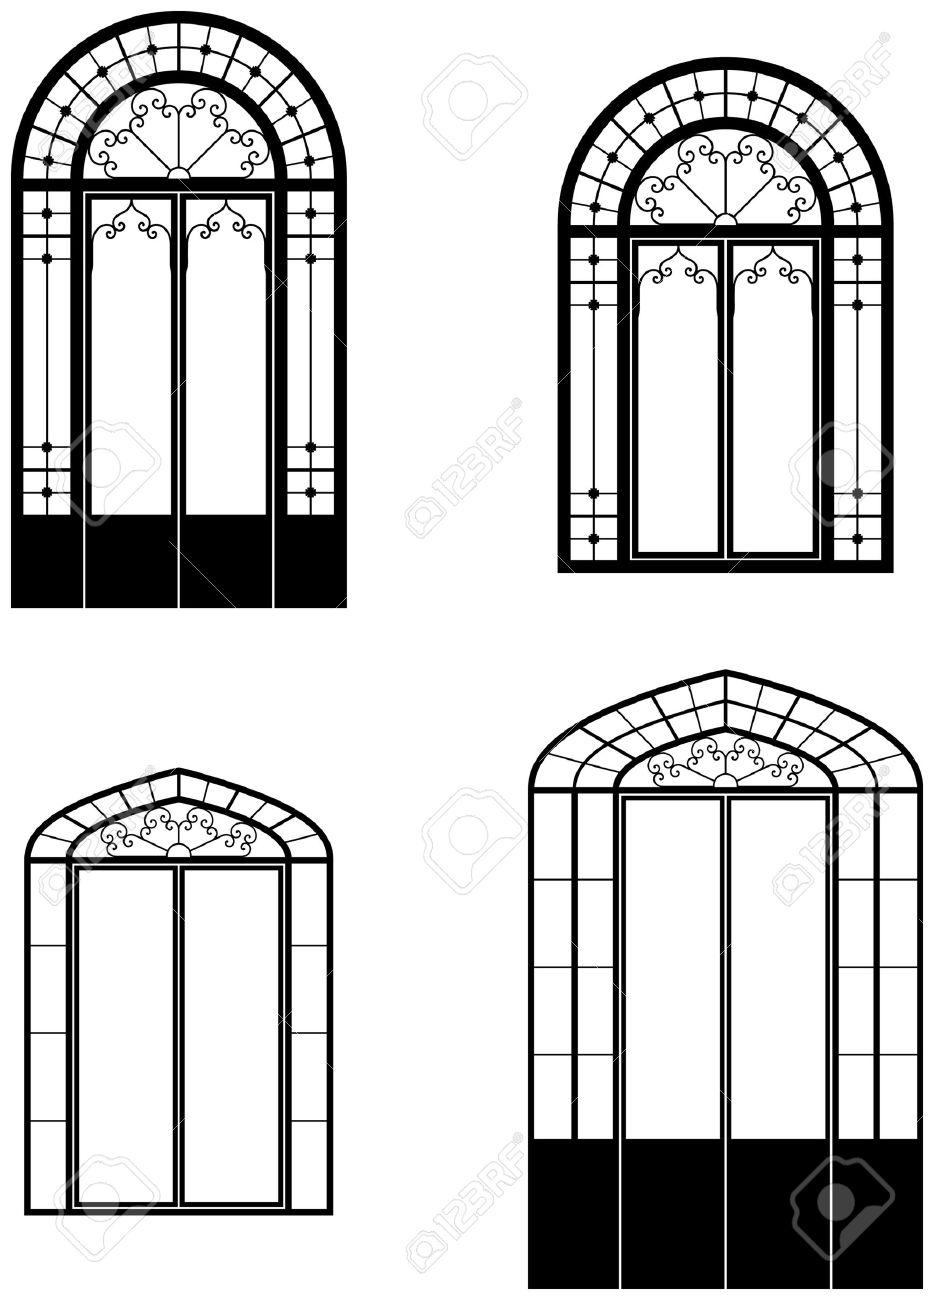 Arched door clipart jpg free stock Arched Door Clipart Clipground, Door Design Clip Art - Getoutma jpg free stock